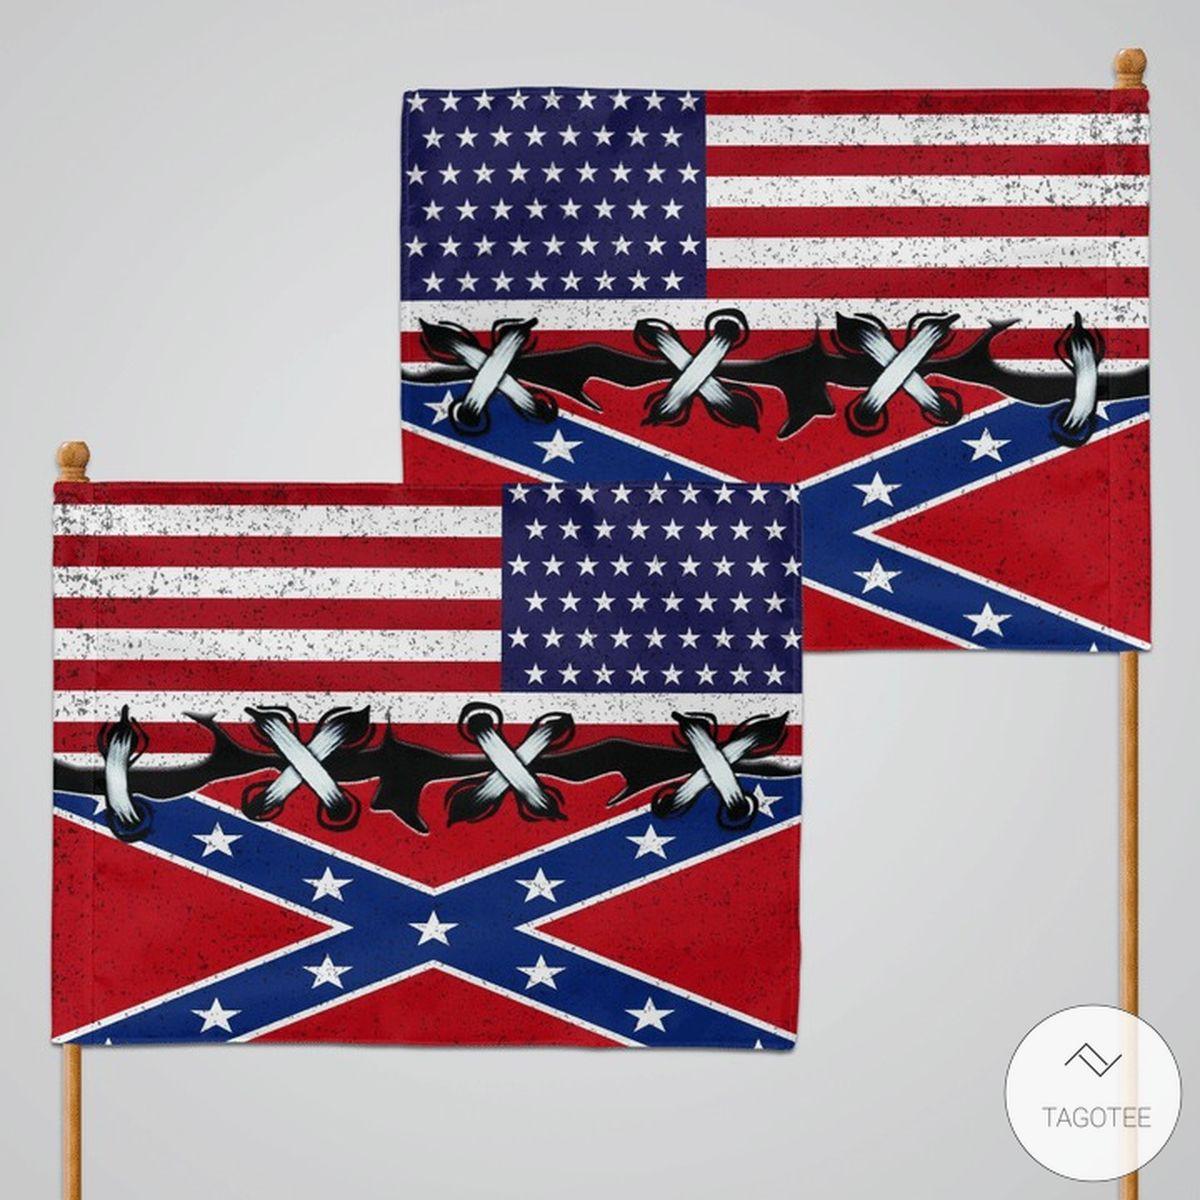 The Confederate Flag And US Flagz